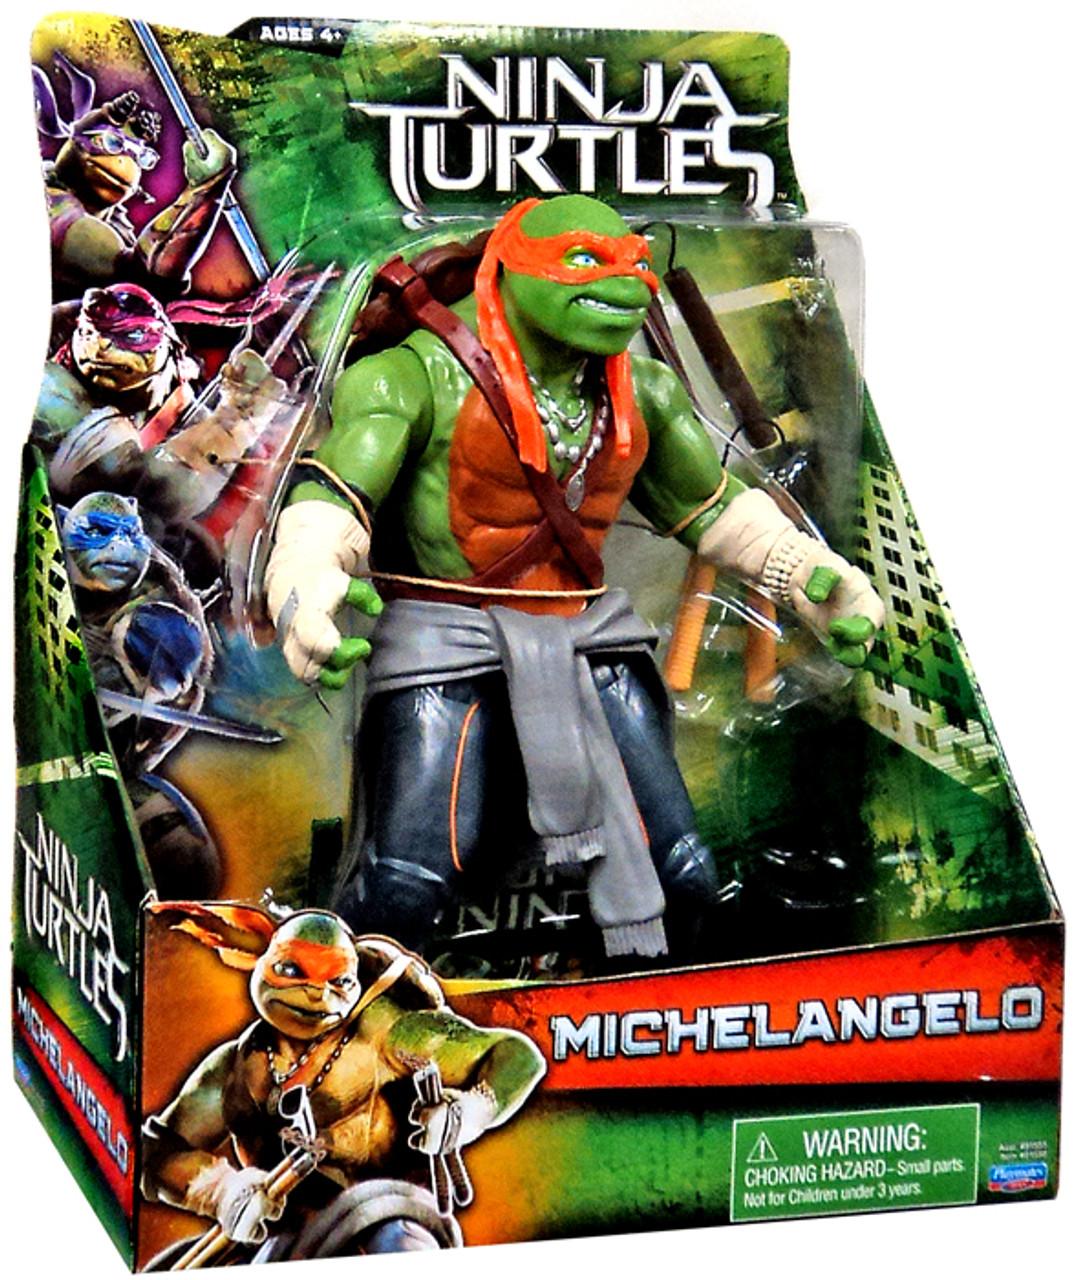 Teenage Mutant Ninja Turtles 2014 Movie 11 Inch Michelangelo 11 Action Figure Playmates Toywiz